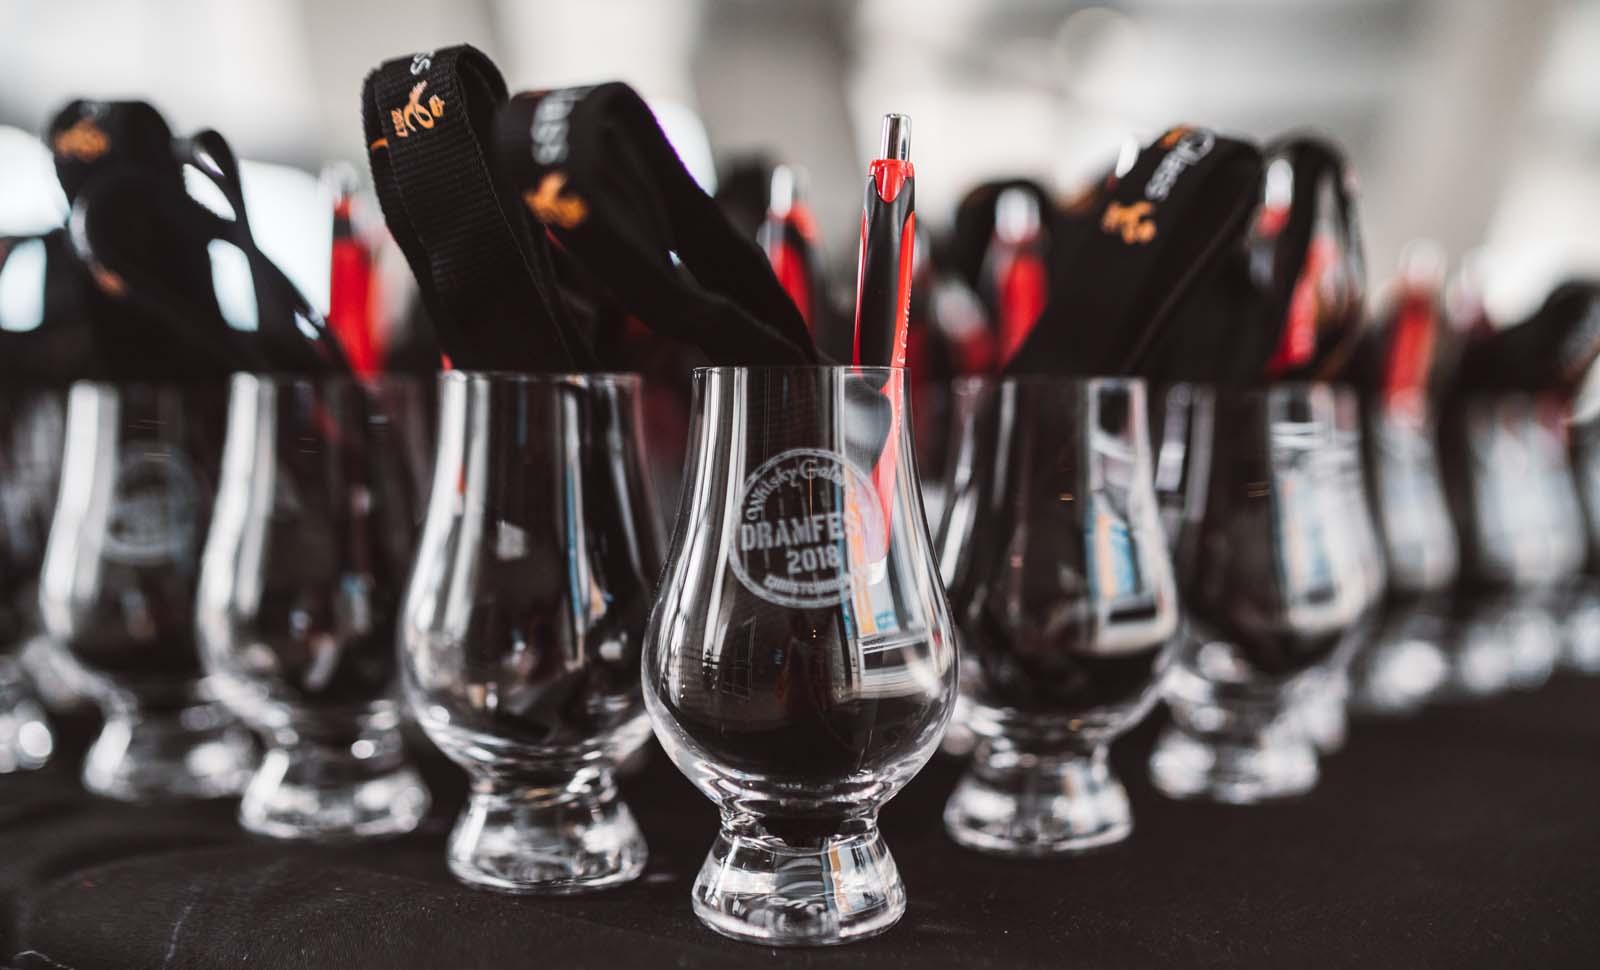 Dramfest 2018 for Whisky Galore-13.jpg